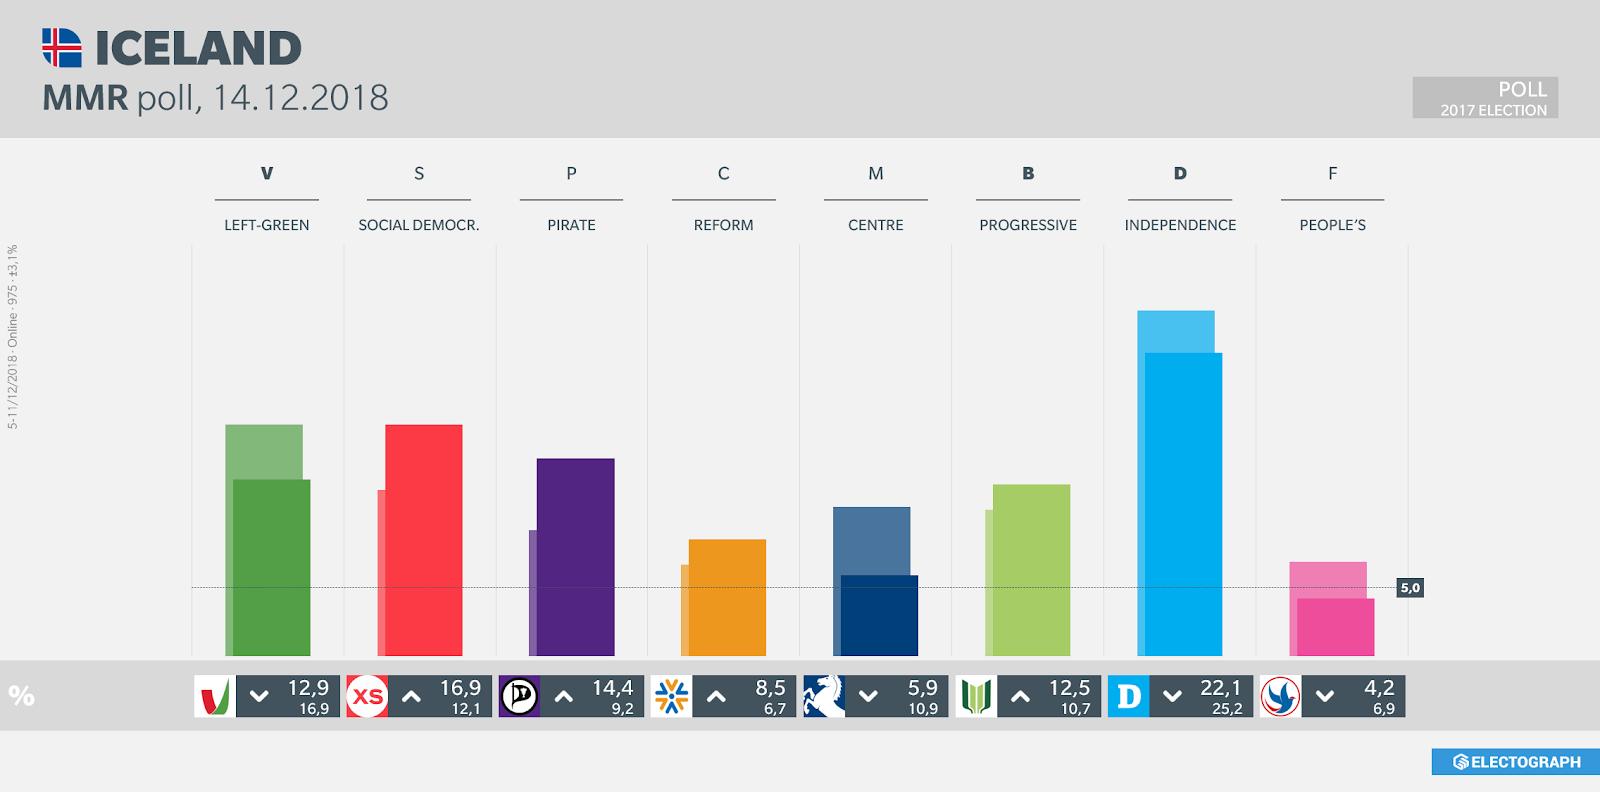 ICELAND: MMR poll chart, 14 December 2018